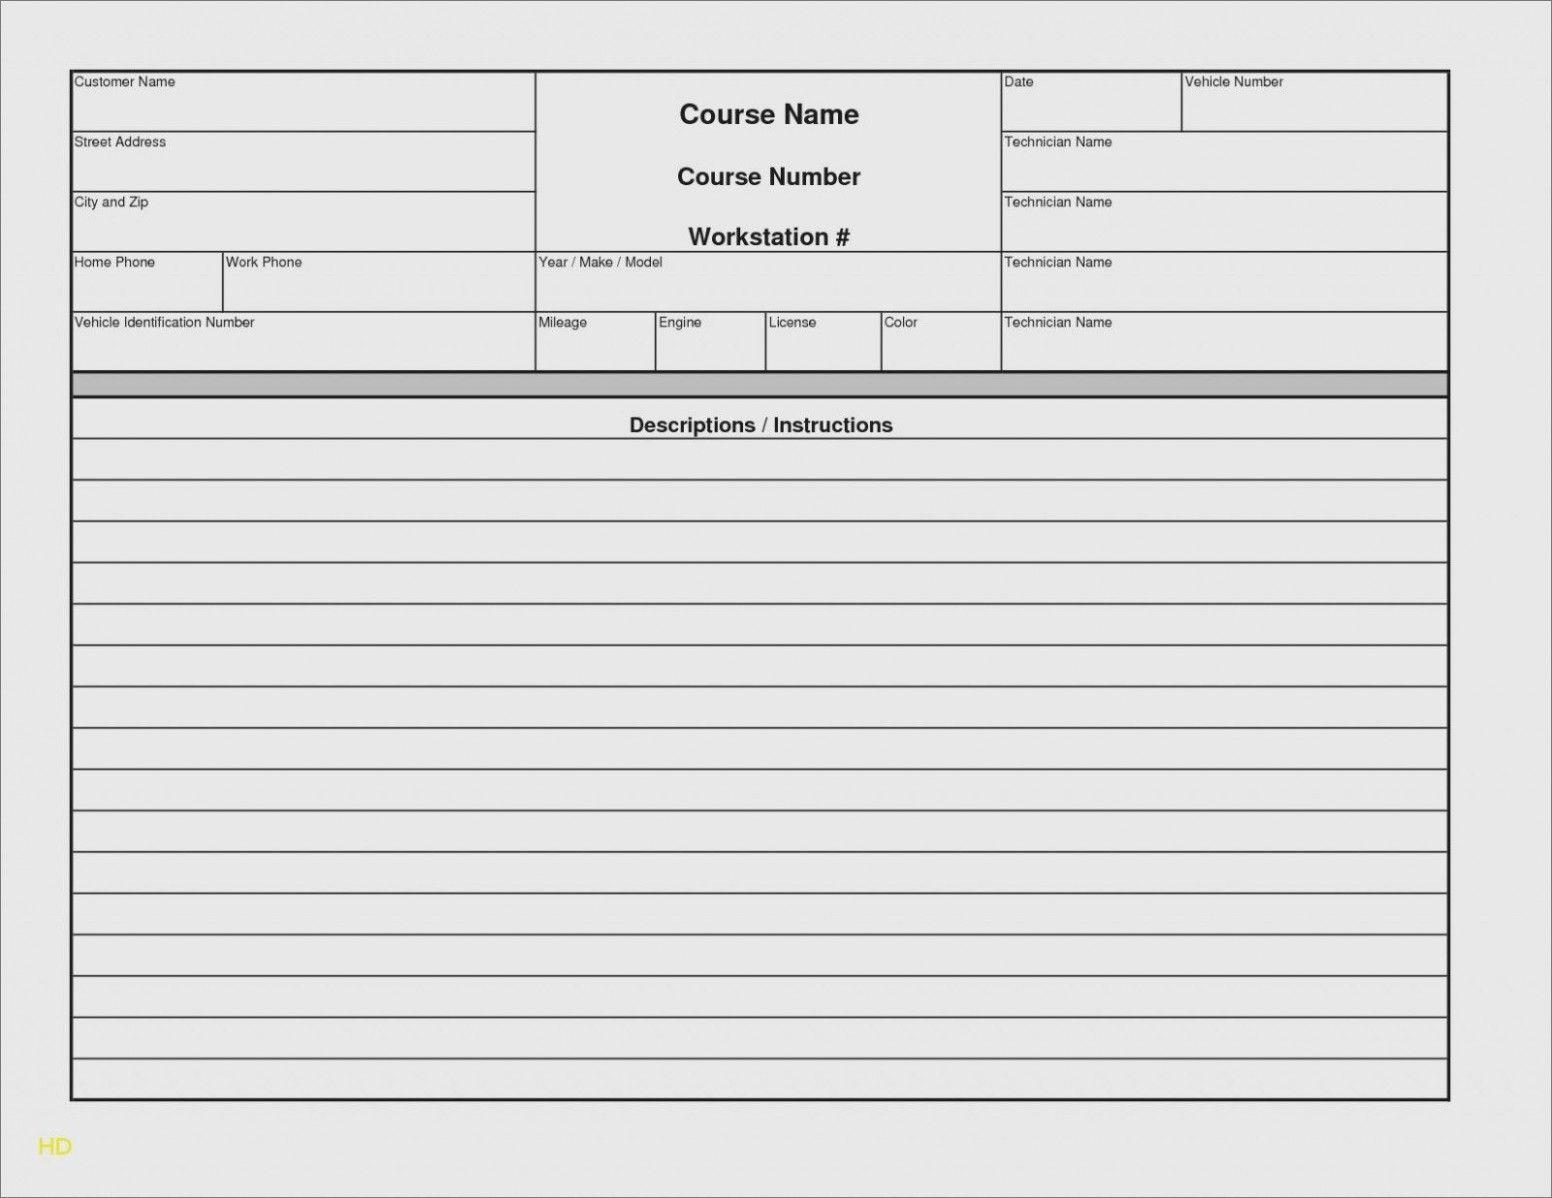 004 Unusual Automotive Repair Invoice Template Free Sample  Auto Excel PdfFull